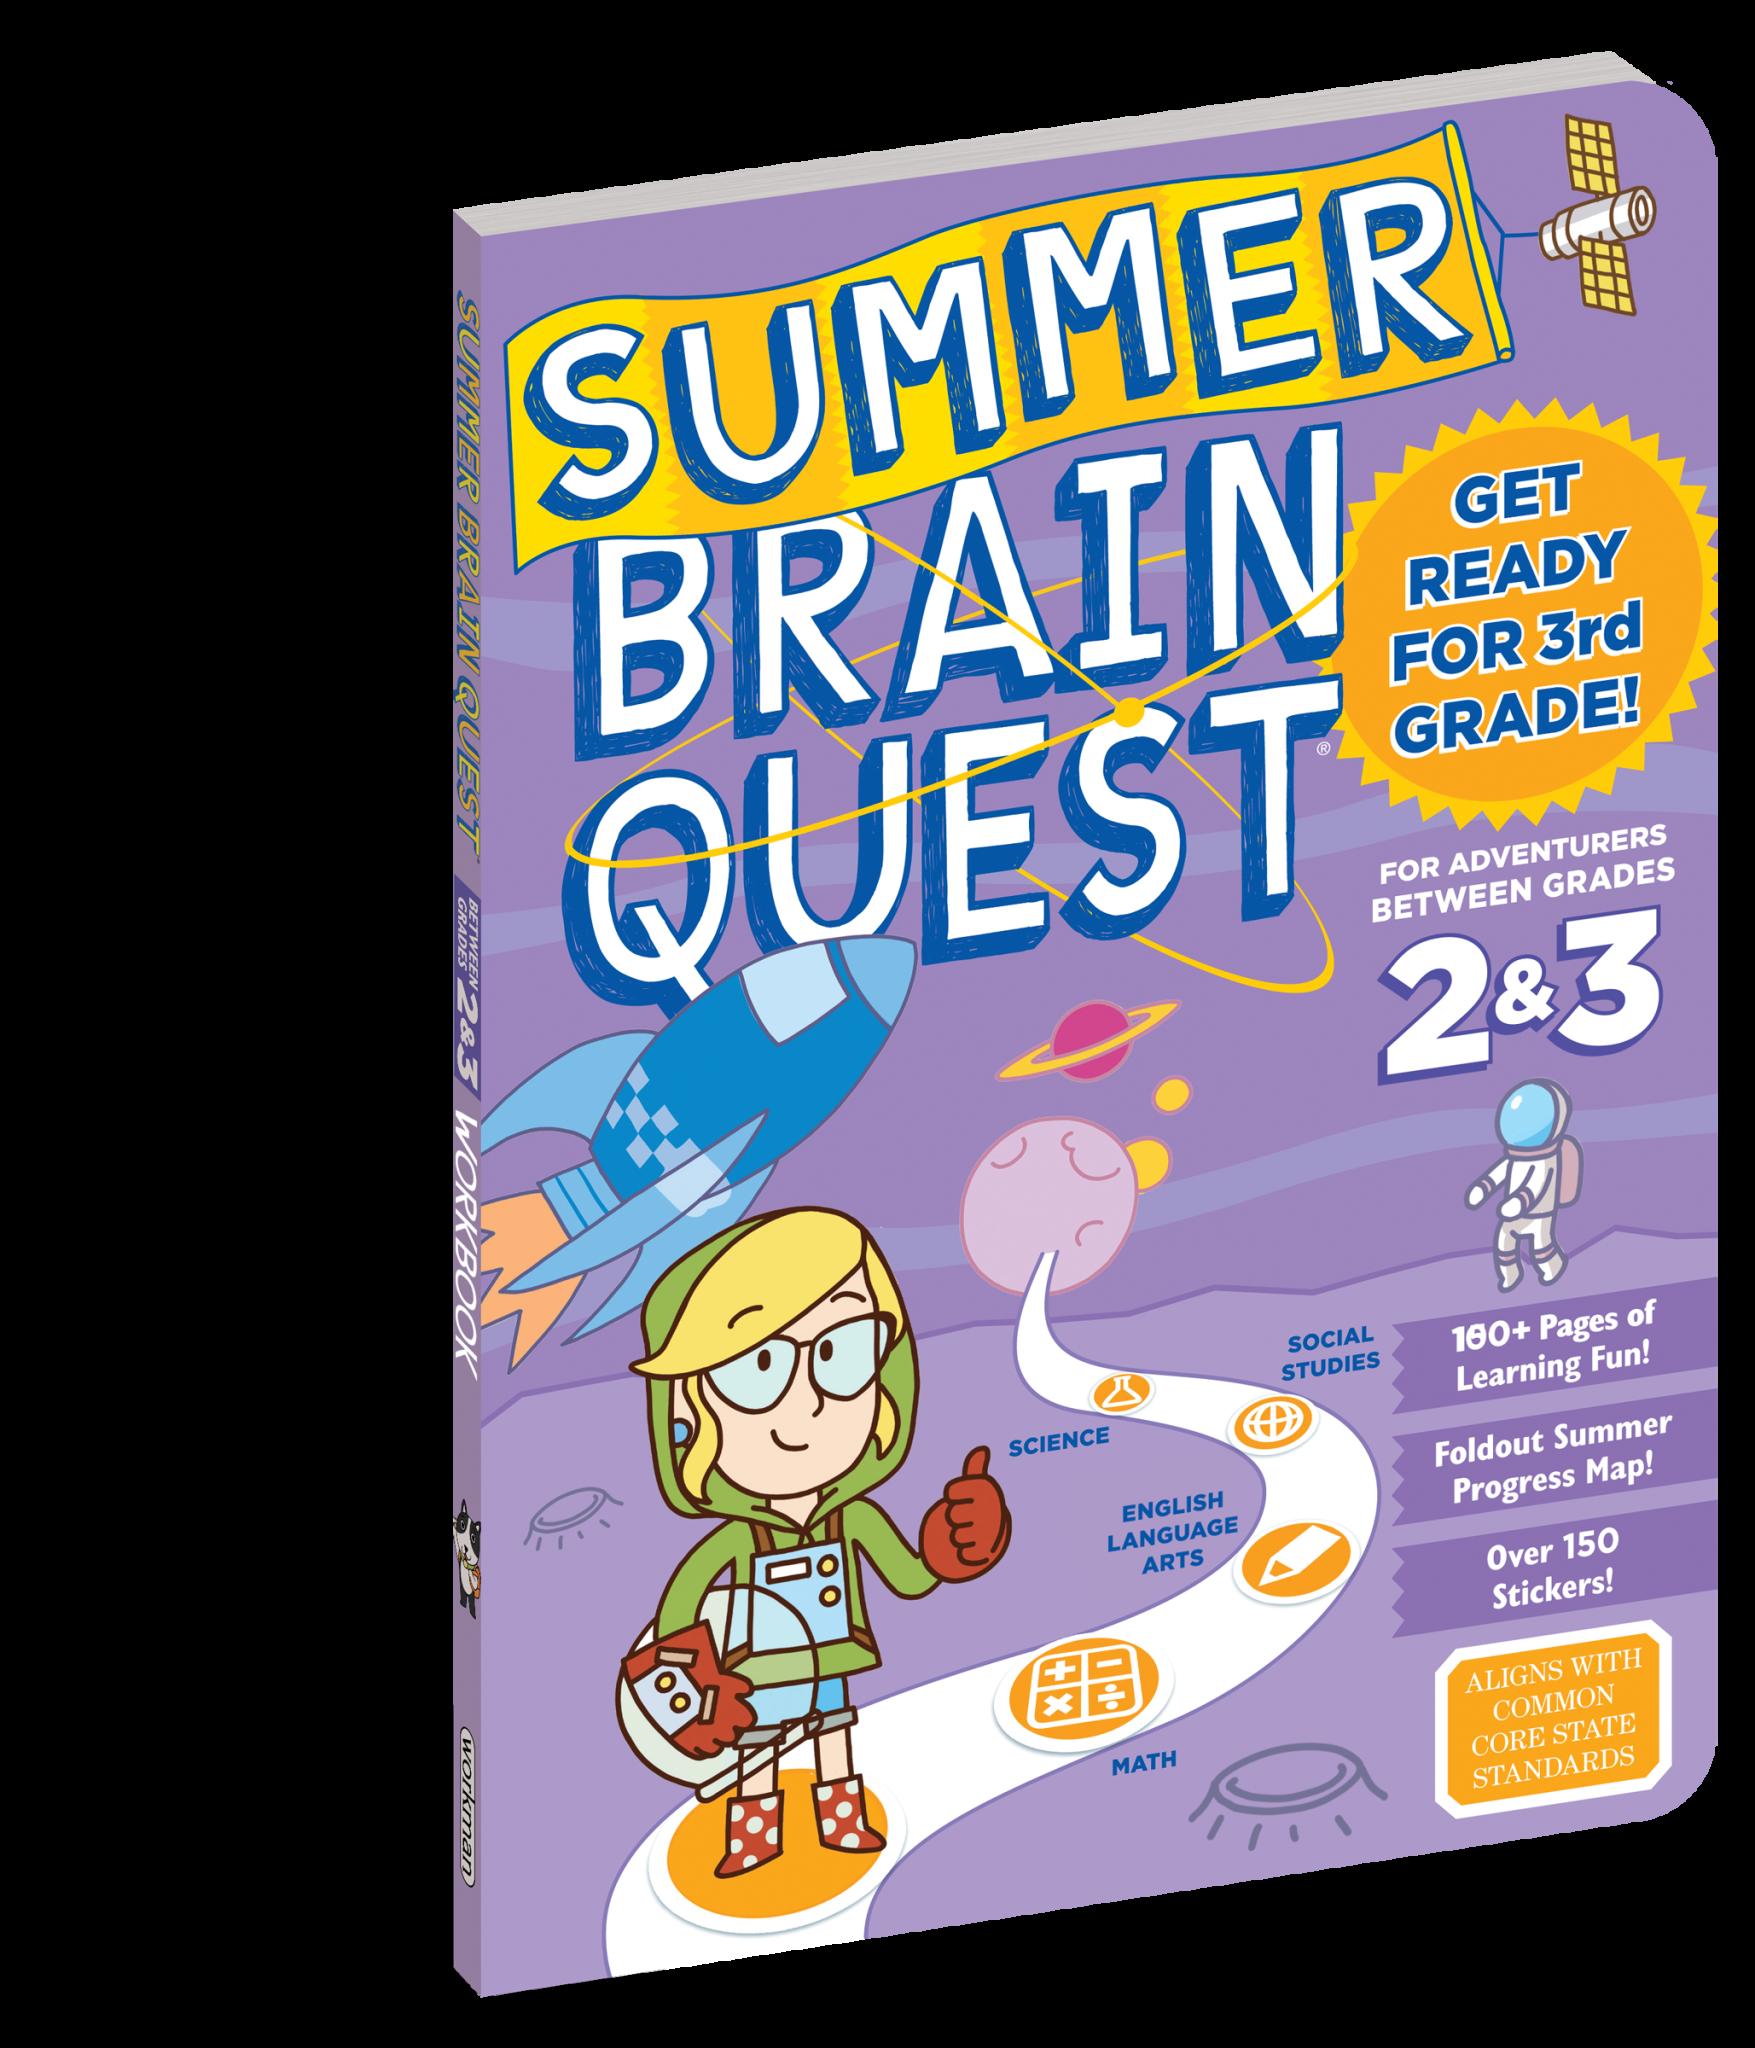 Summer Brain Quest Workbooks by Grade 2nd to 3rd